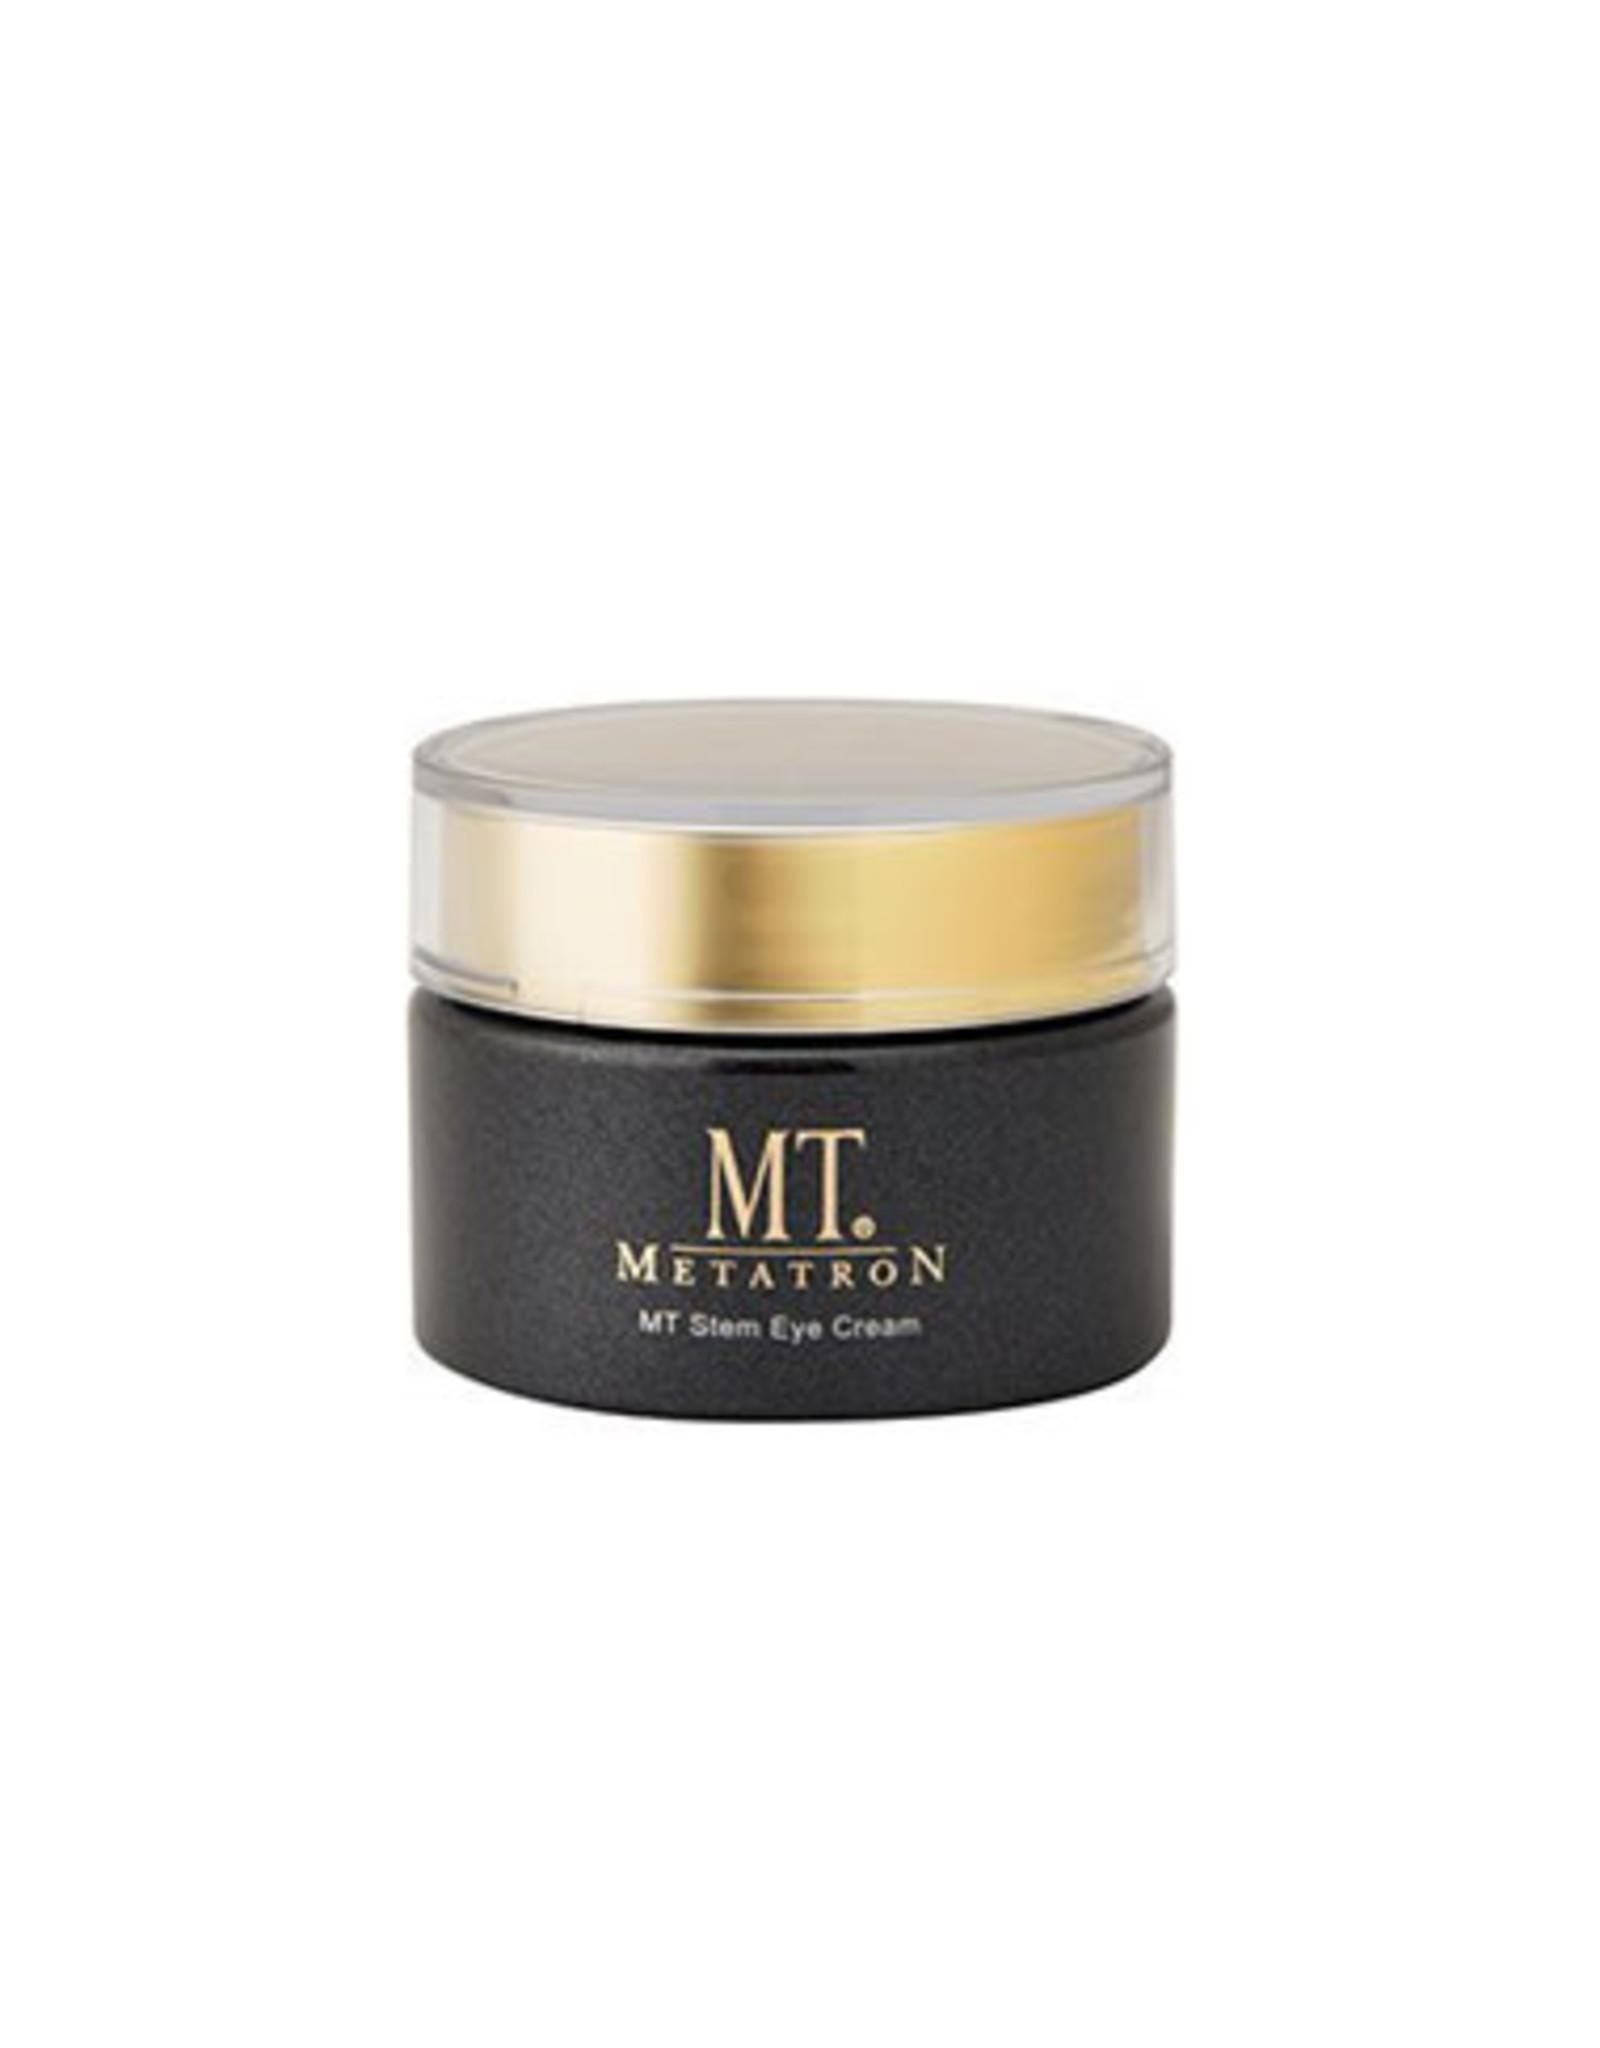 MT Metatron MT Metatron Stem Eye Cream